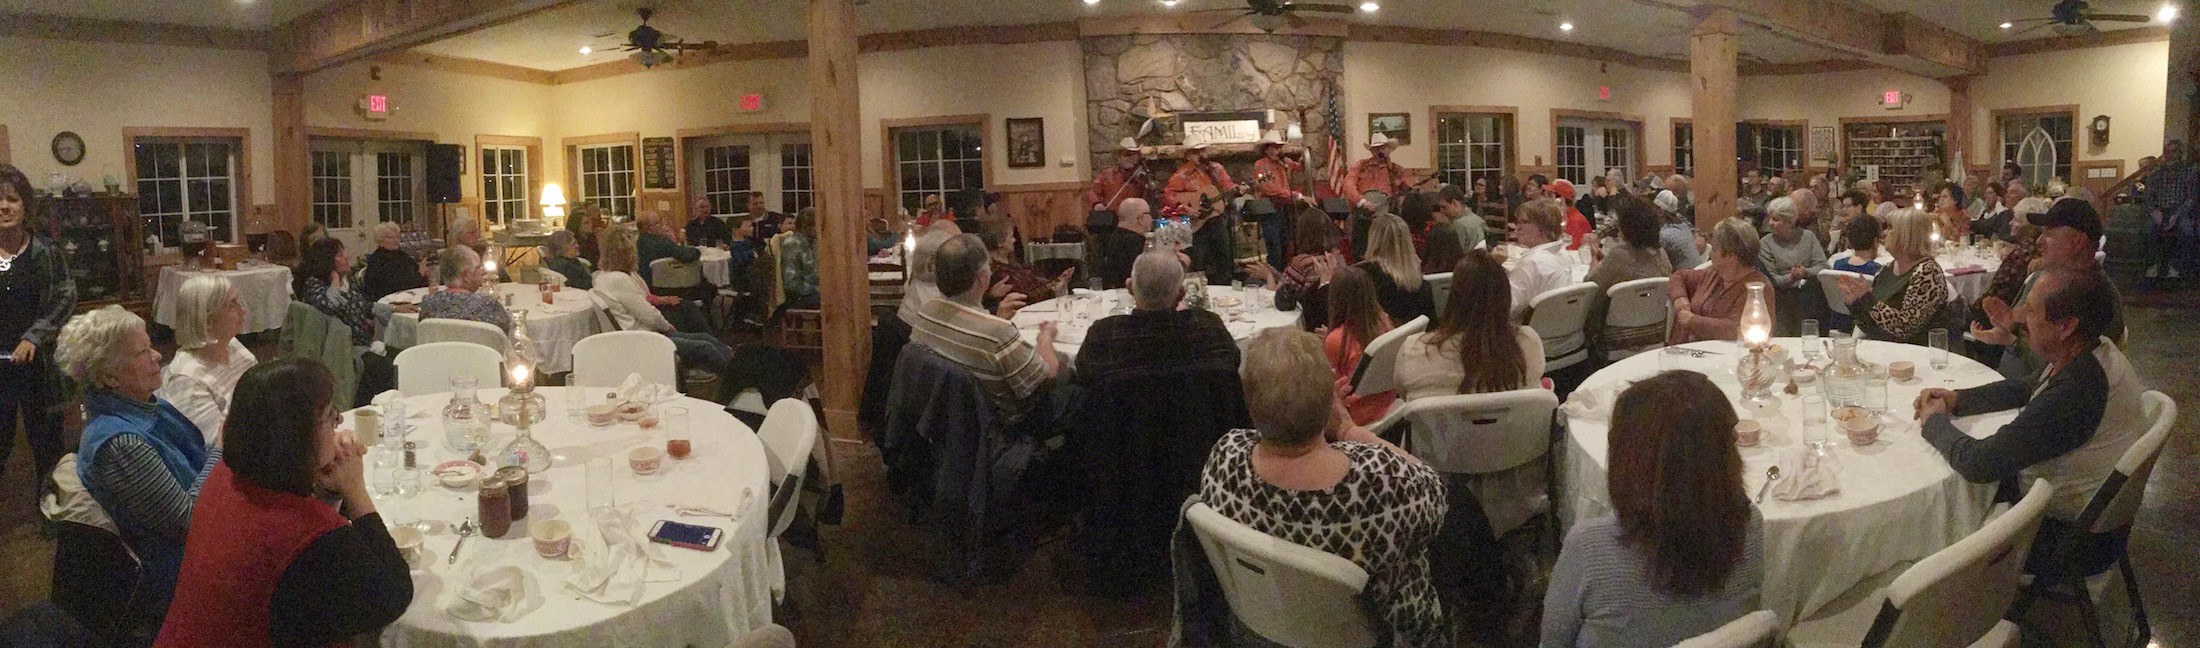 Amish Dinner & Bluegrass Evening